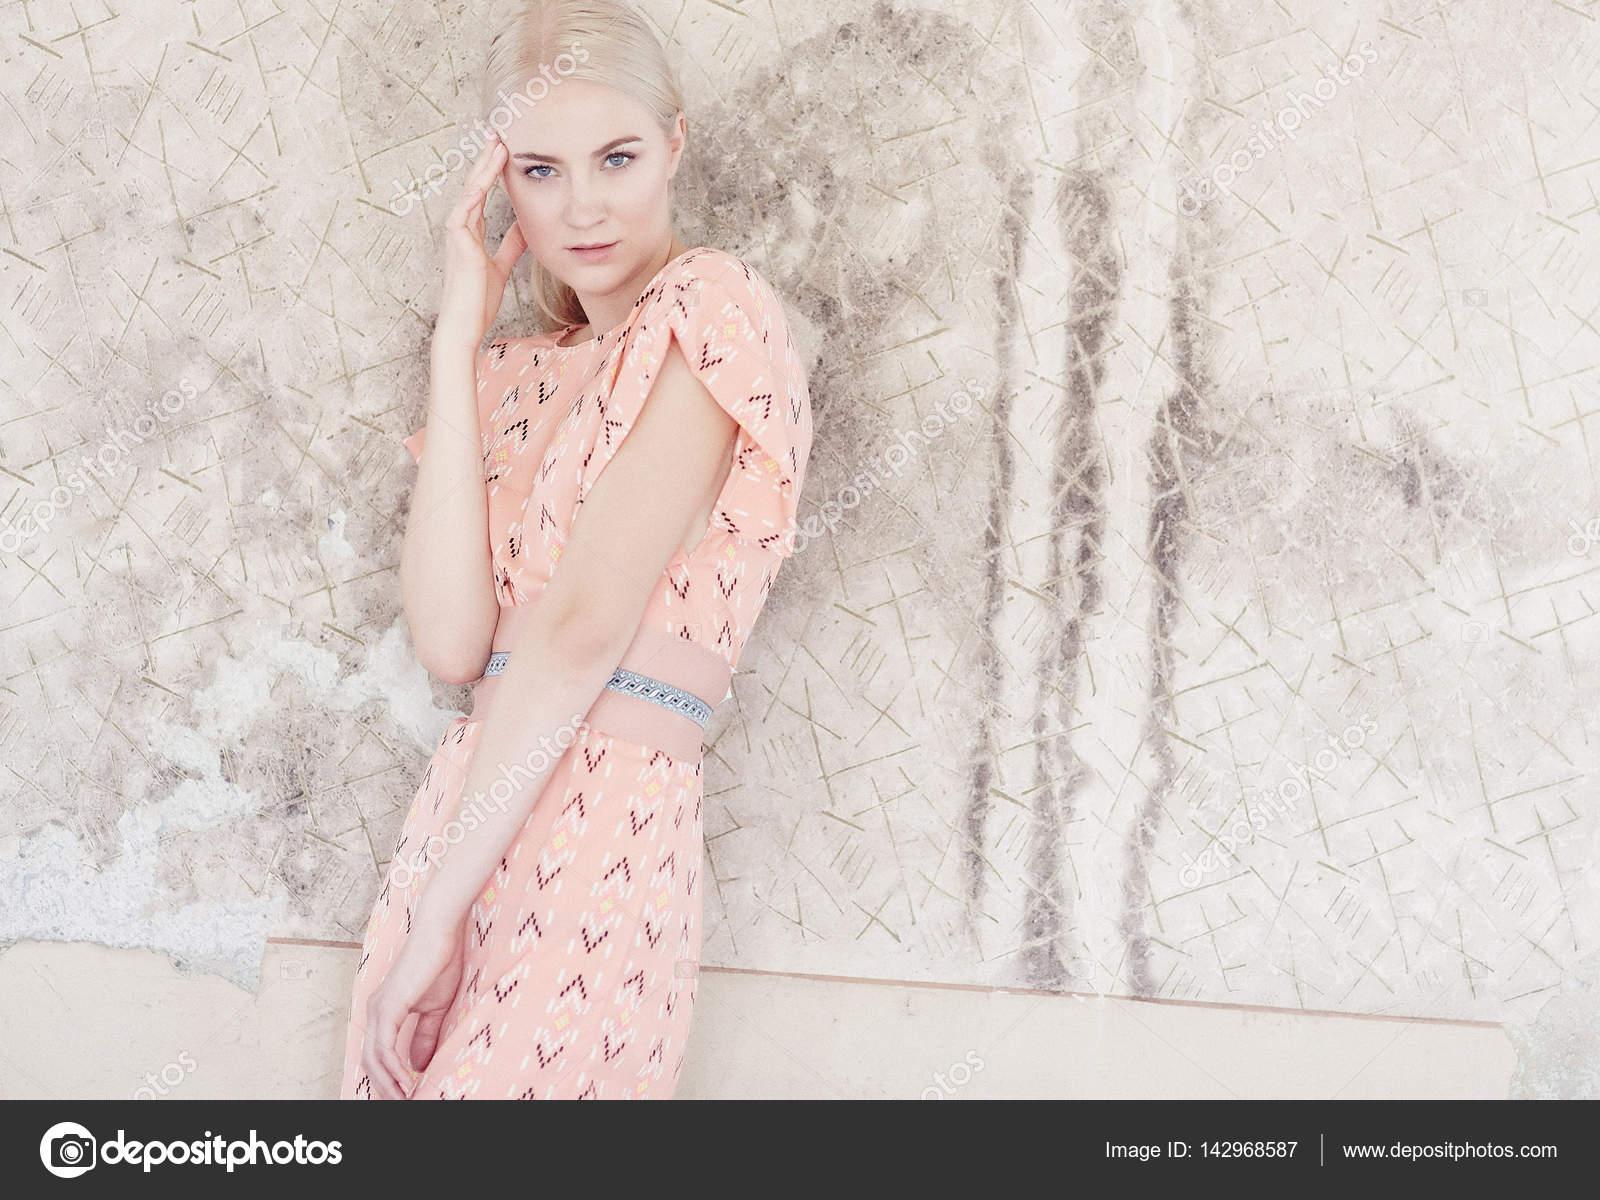 Licht Roze Jurk : Blonde vrouw in een licht roze jurk u2014 stockfoto © fxquadro #142968587